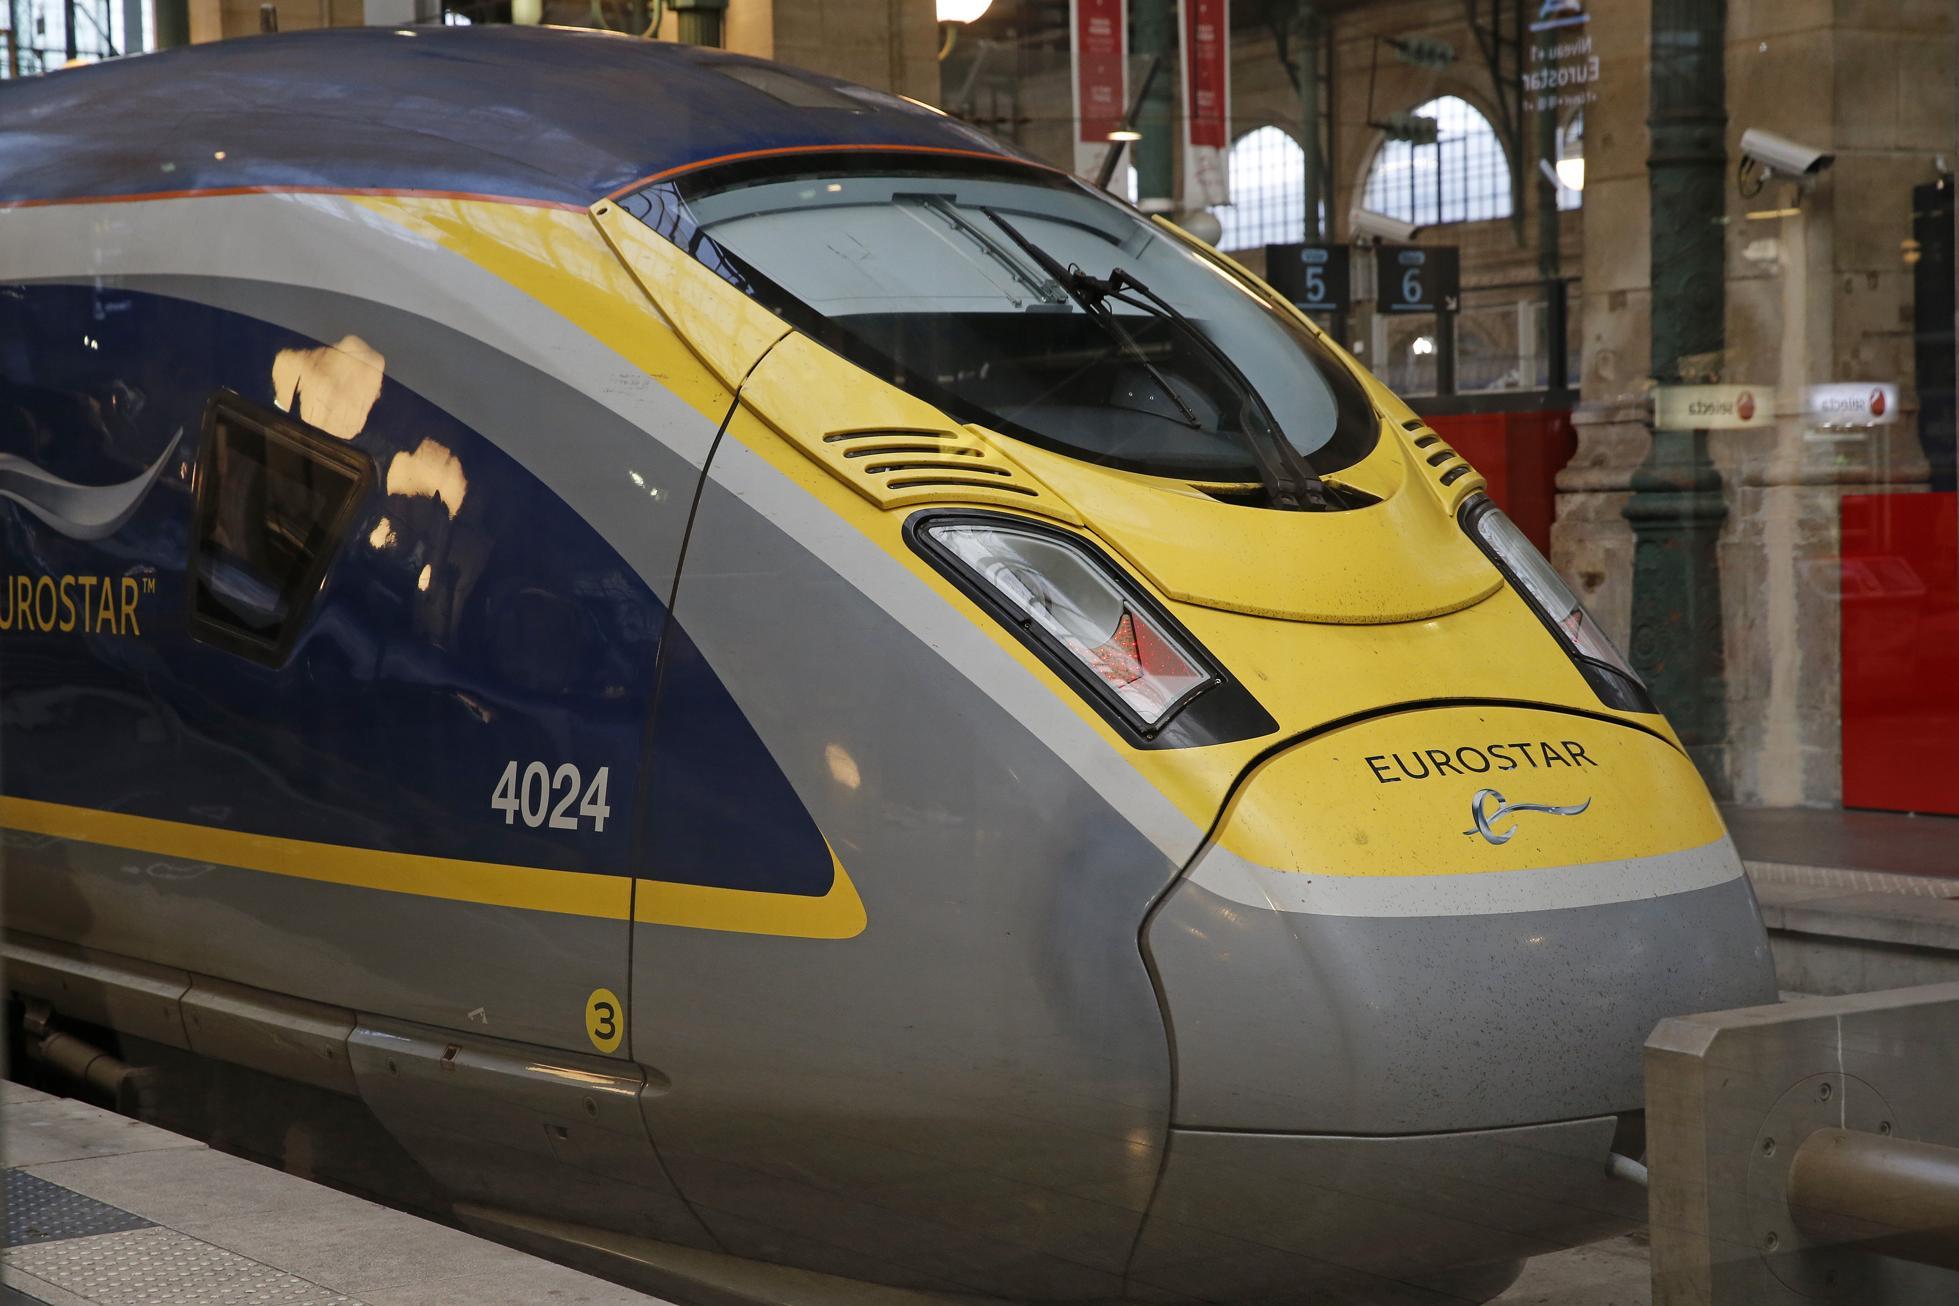 Eurostar Faces Financial Difficulties